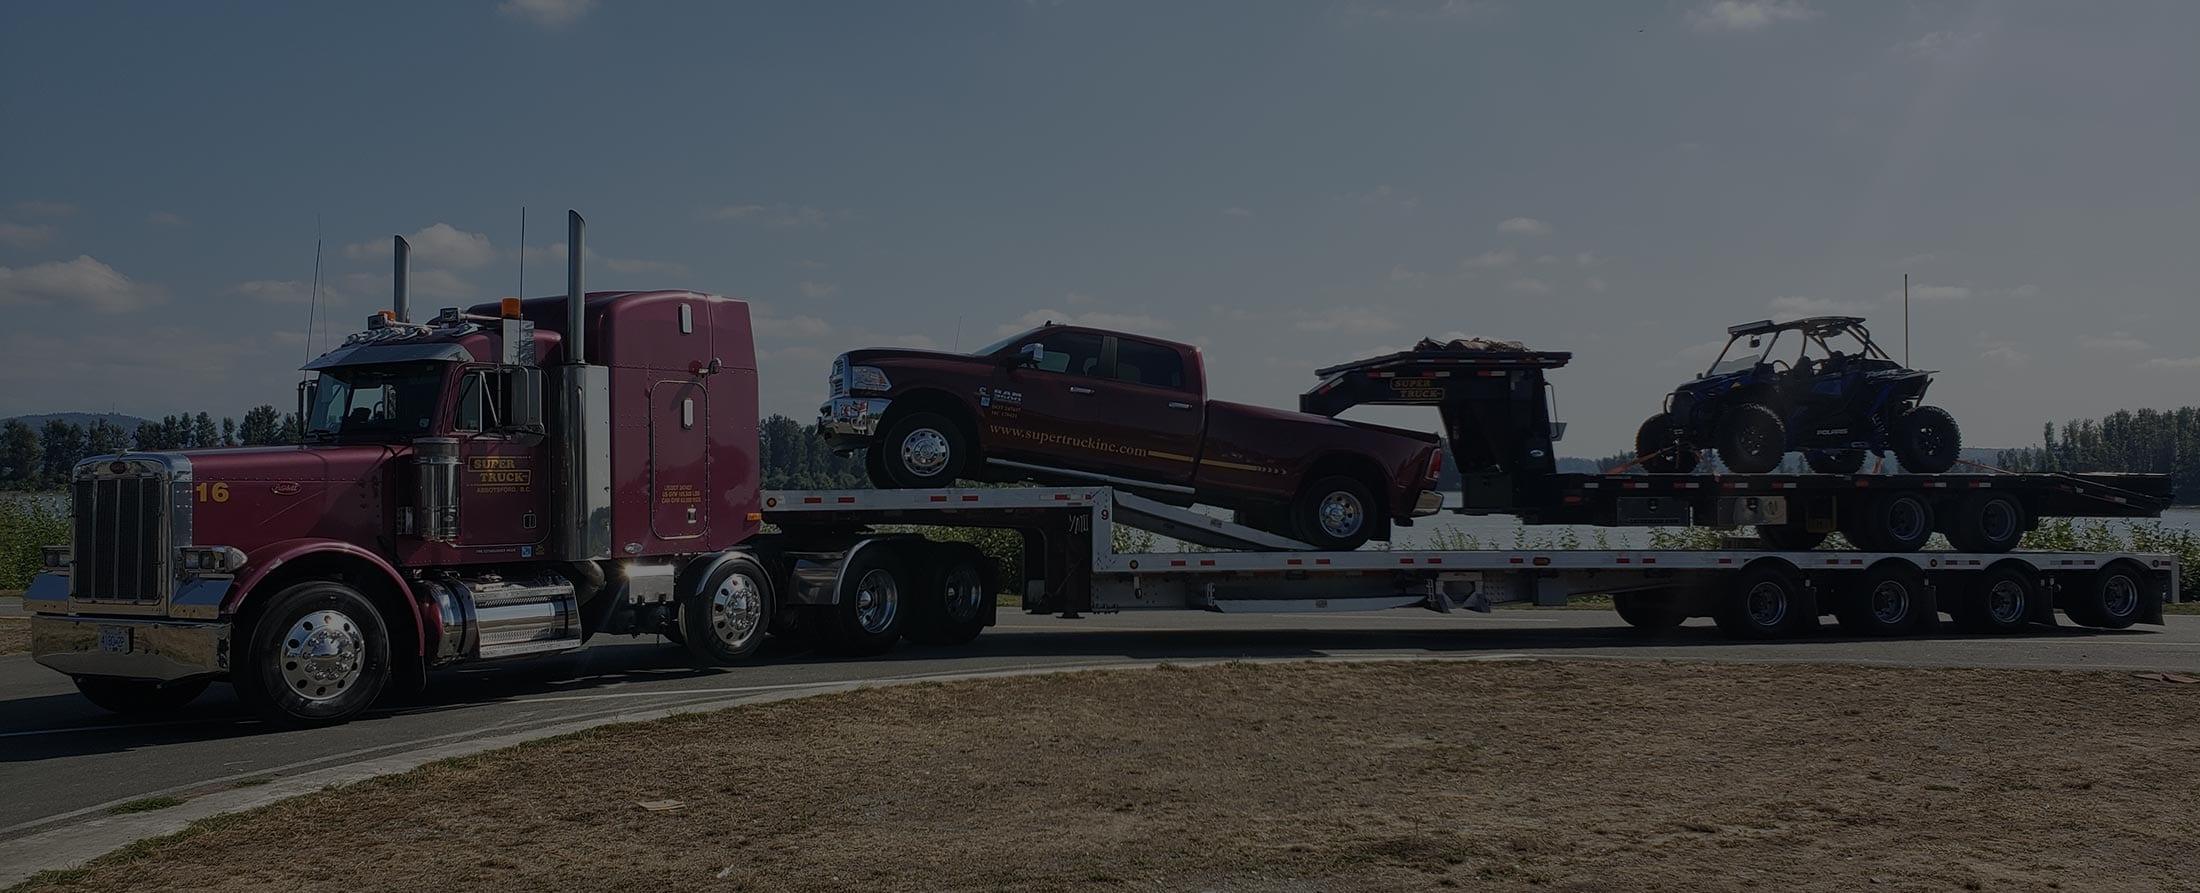 super-truck-heavy-haul